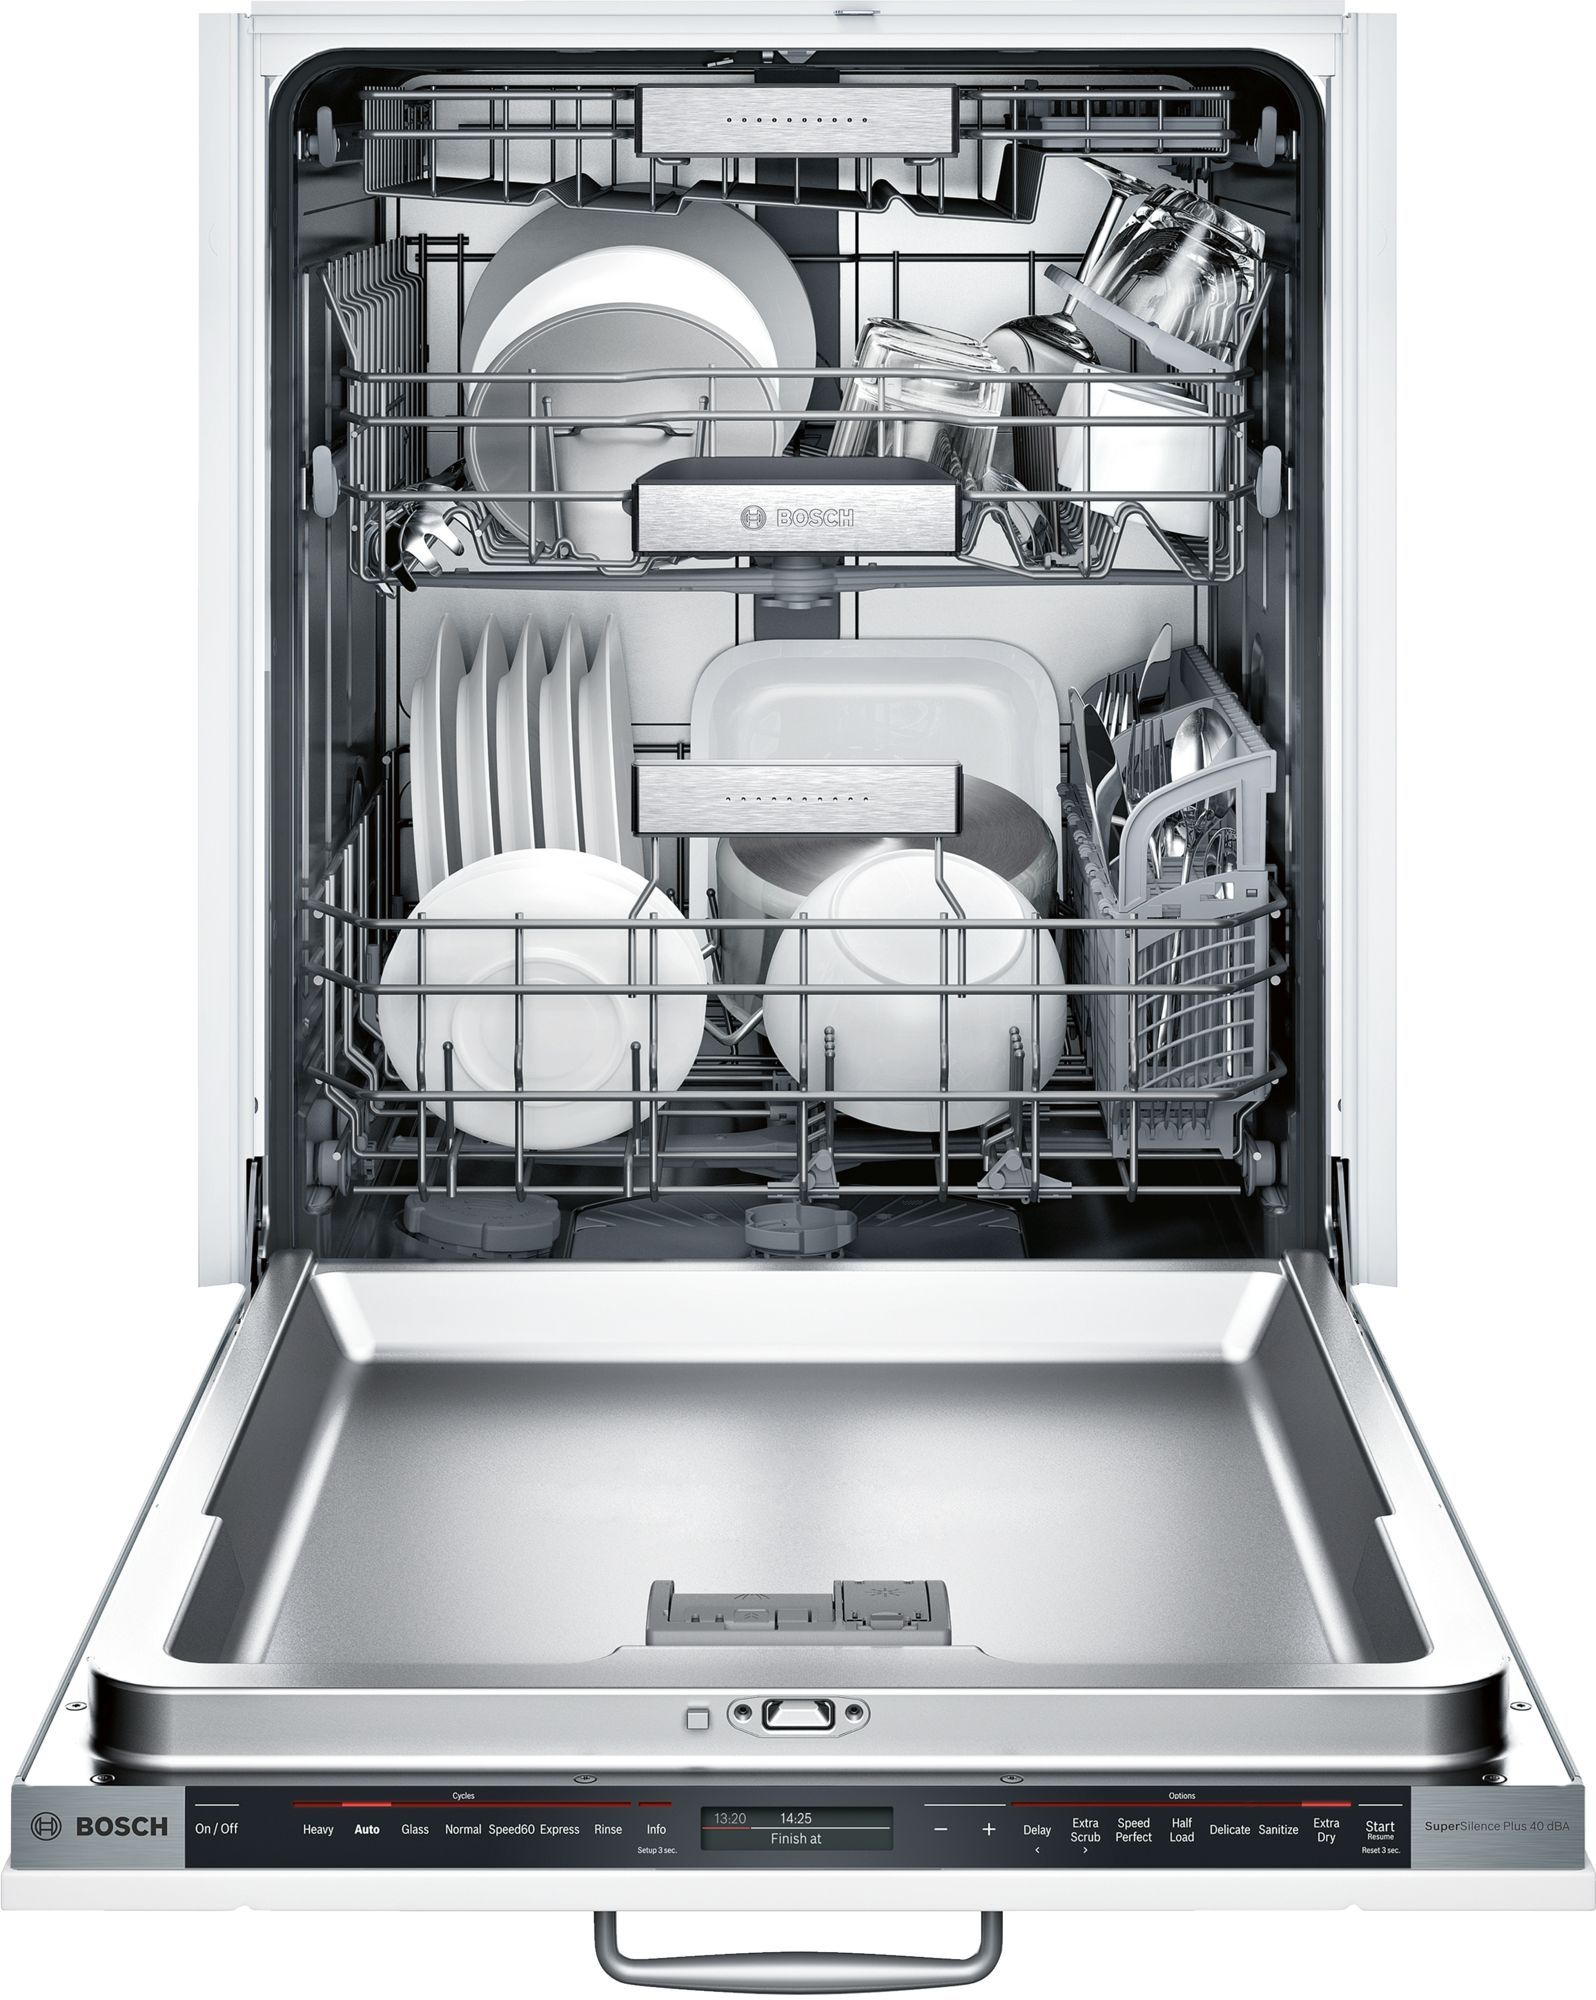 Bosch Shv89pw53n Dishwasher Integrated Dishwasher Bosch Dishwashers Built In Dishwasher